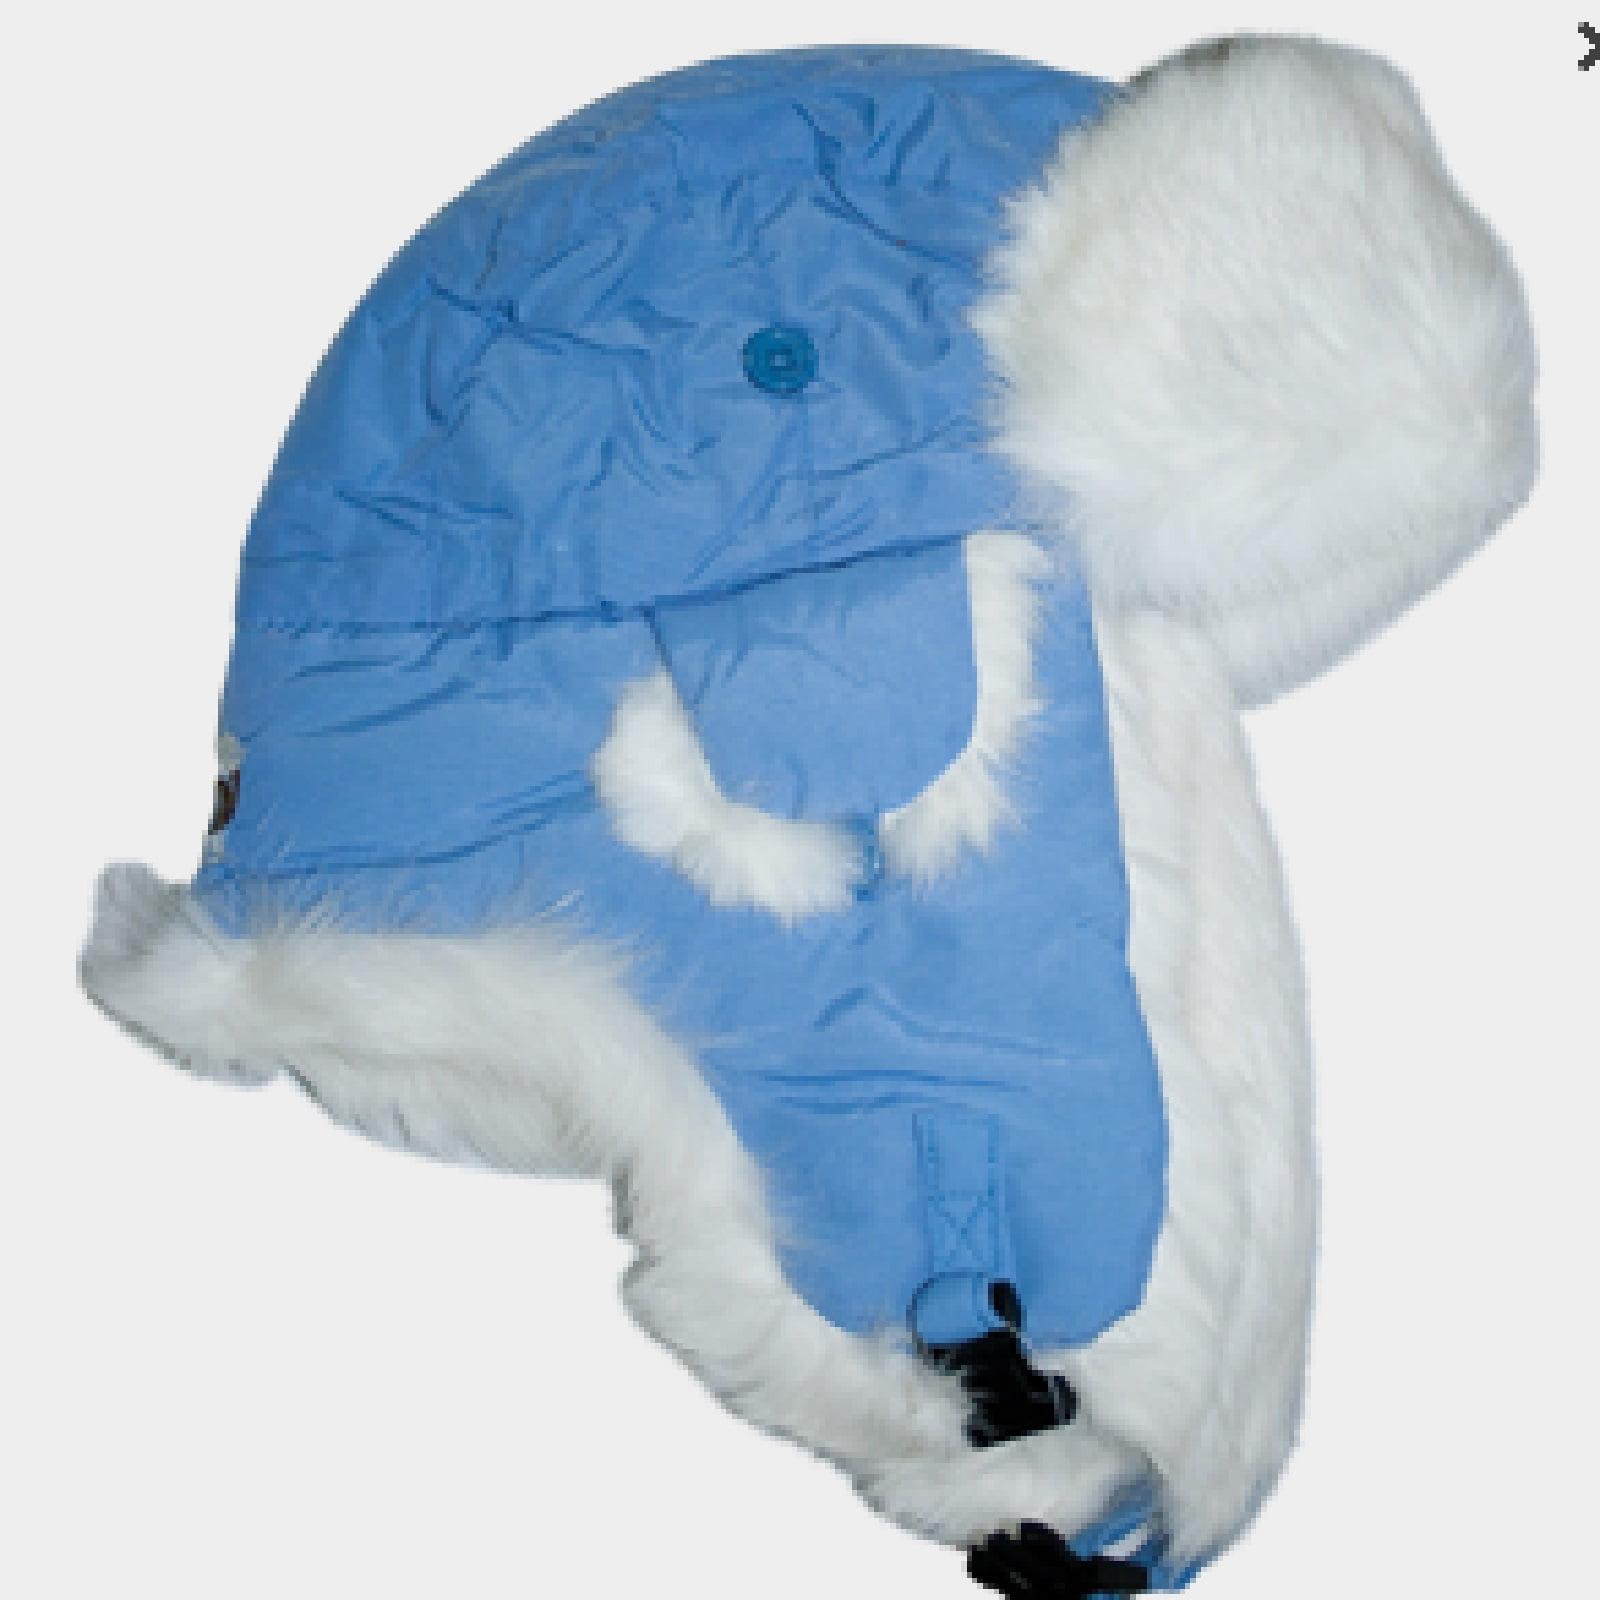 Yukon Tracks Alaskan Powder Blue Yukon Trapper Hat Large, HG673